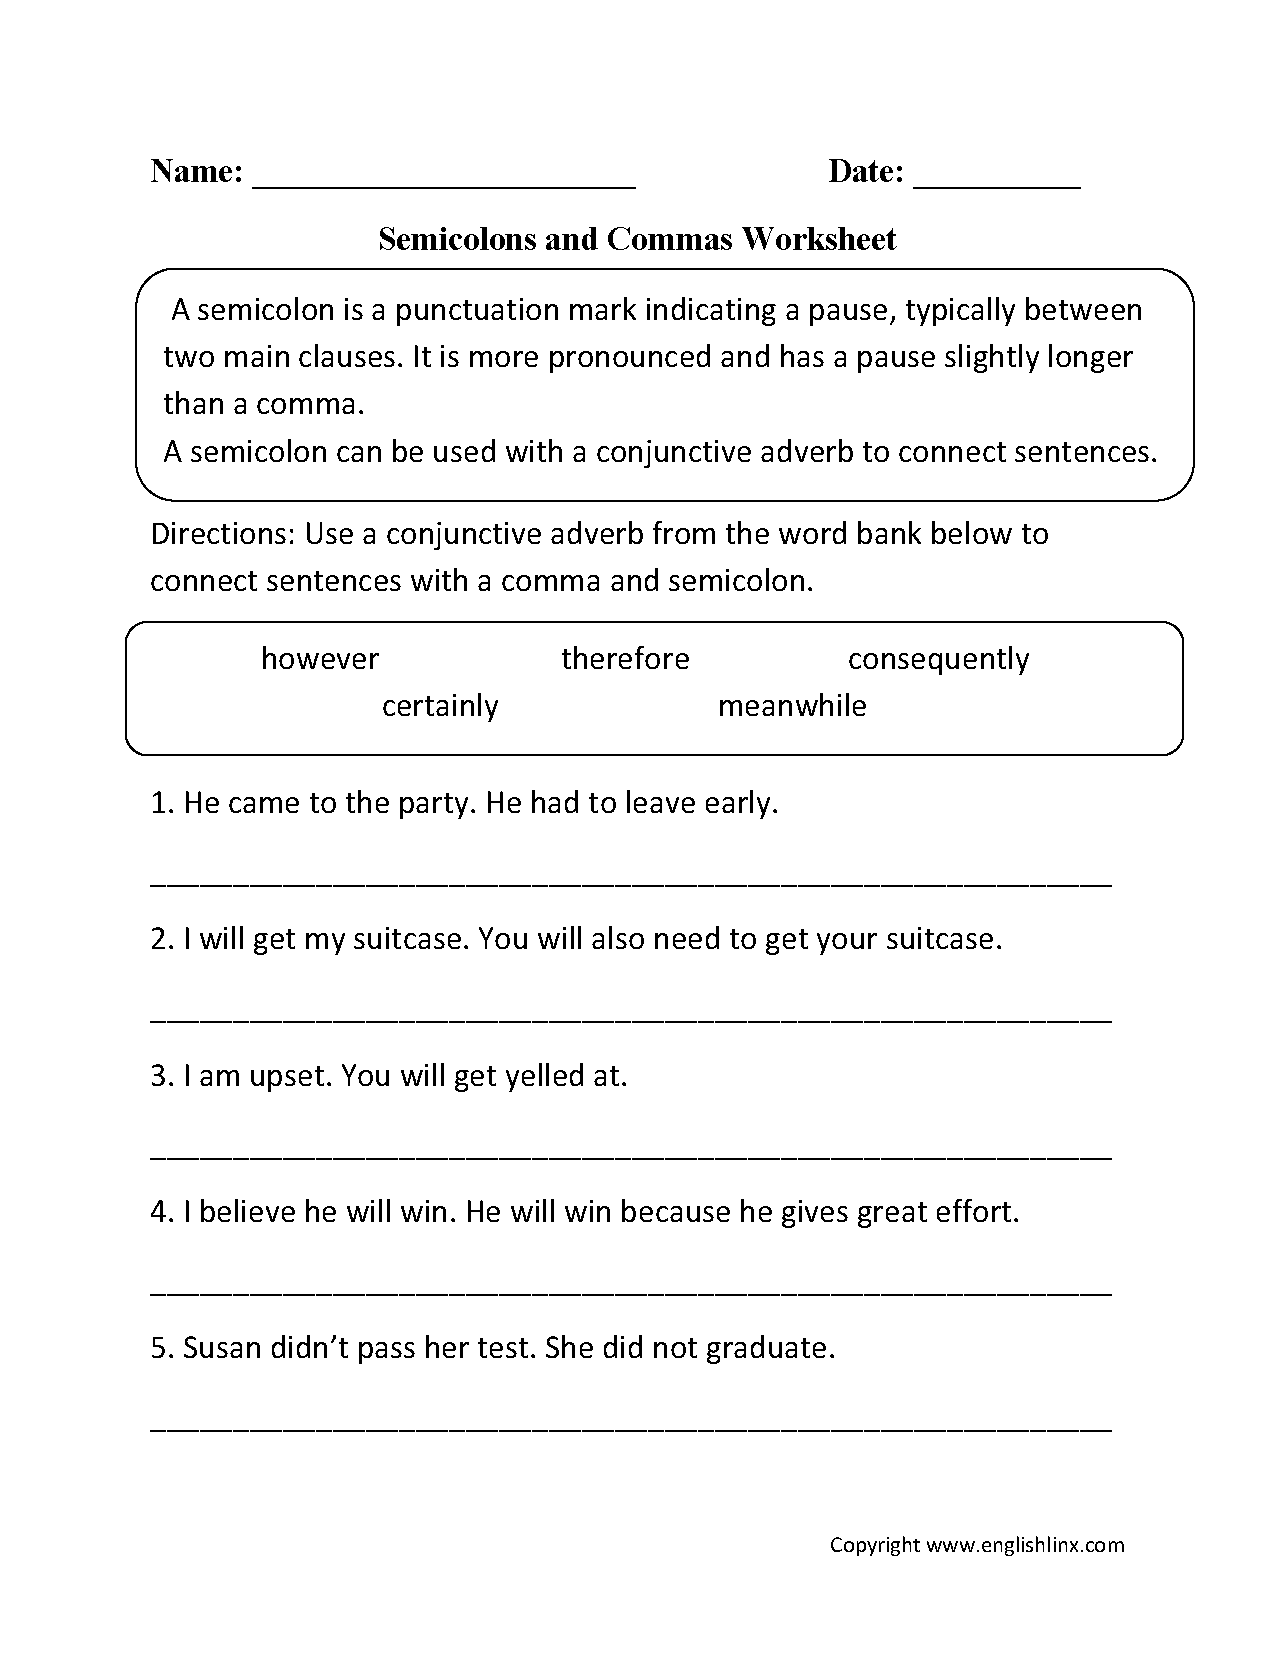 medium resolution of Semicolon and Commas Worksheet   Punctuation worksheets